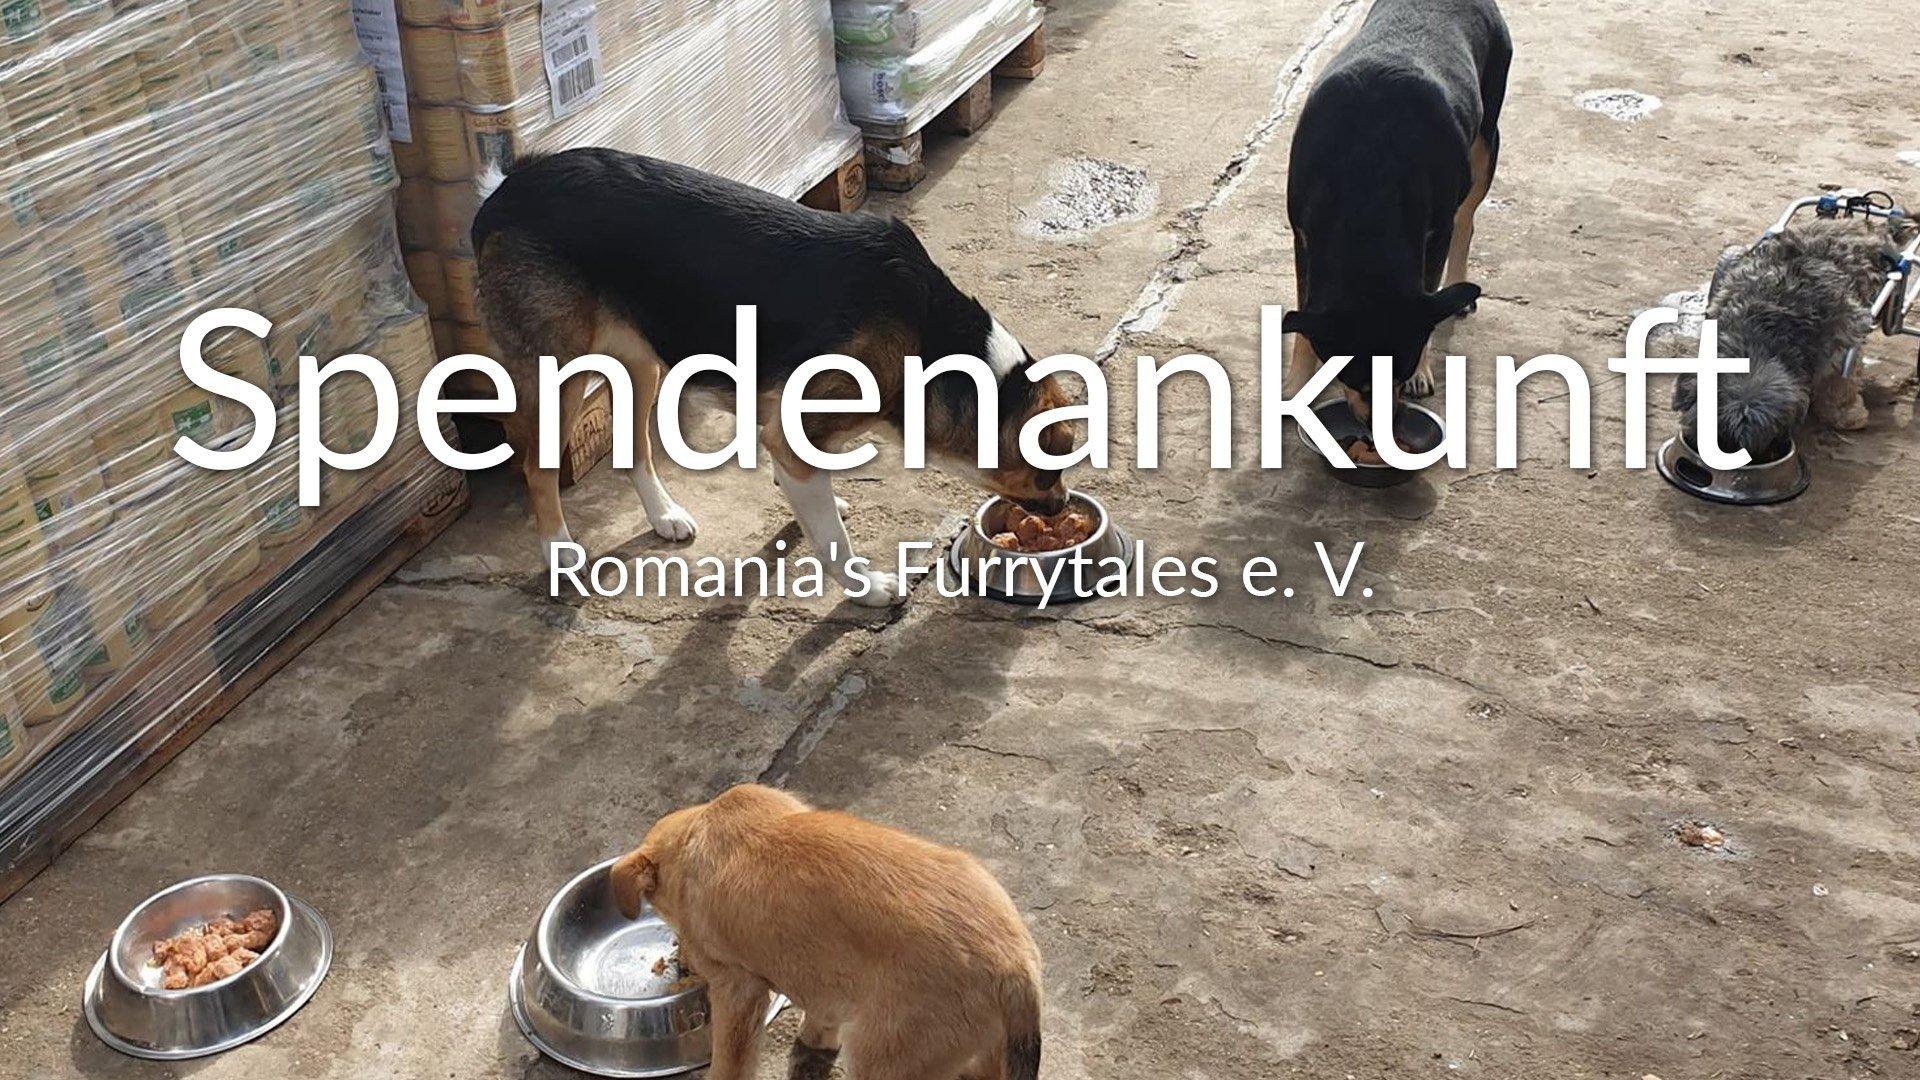 Romania's Furrytales e. V. VIDEO